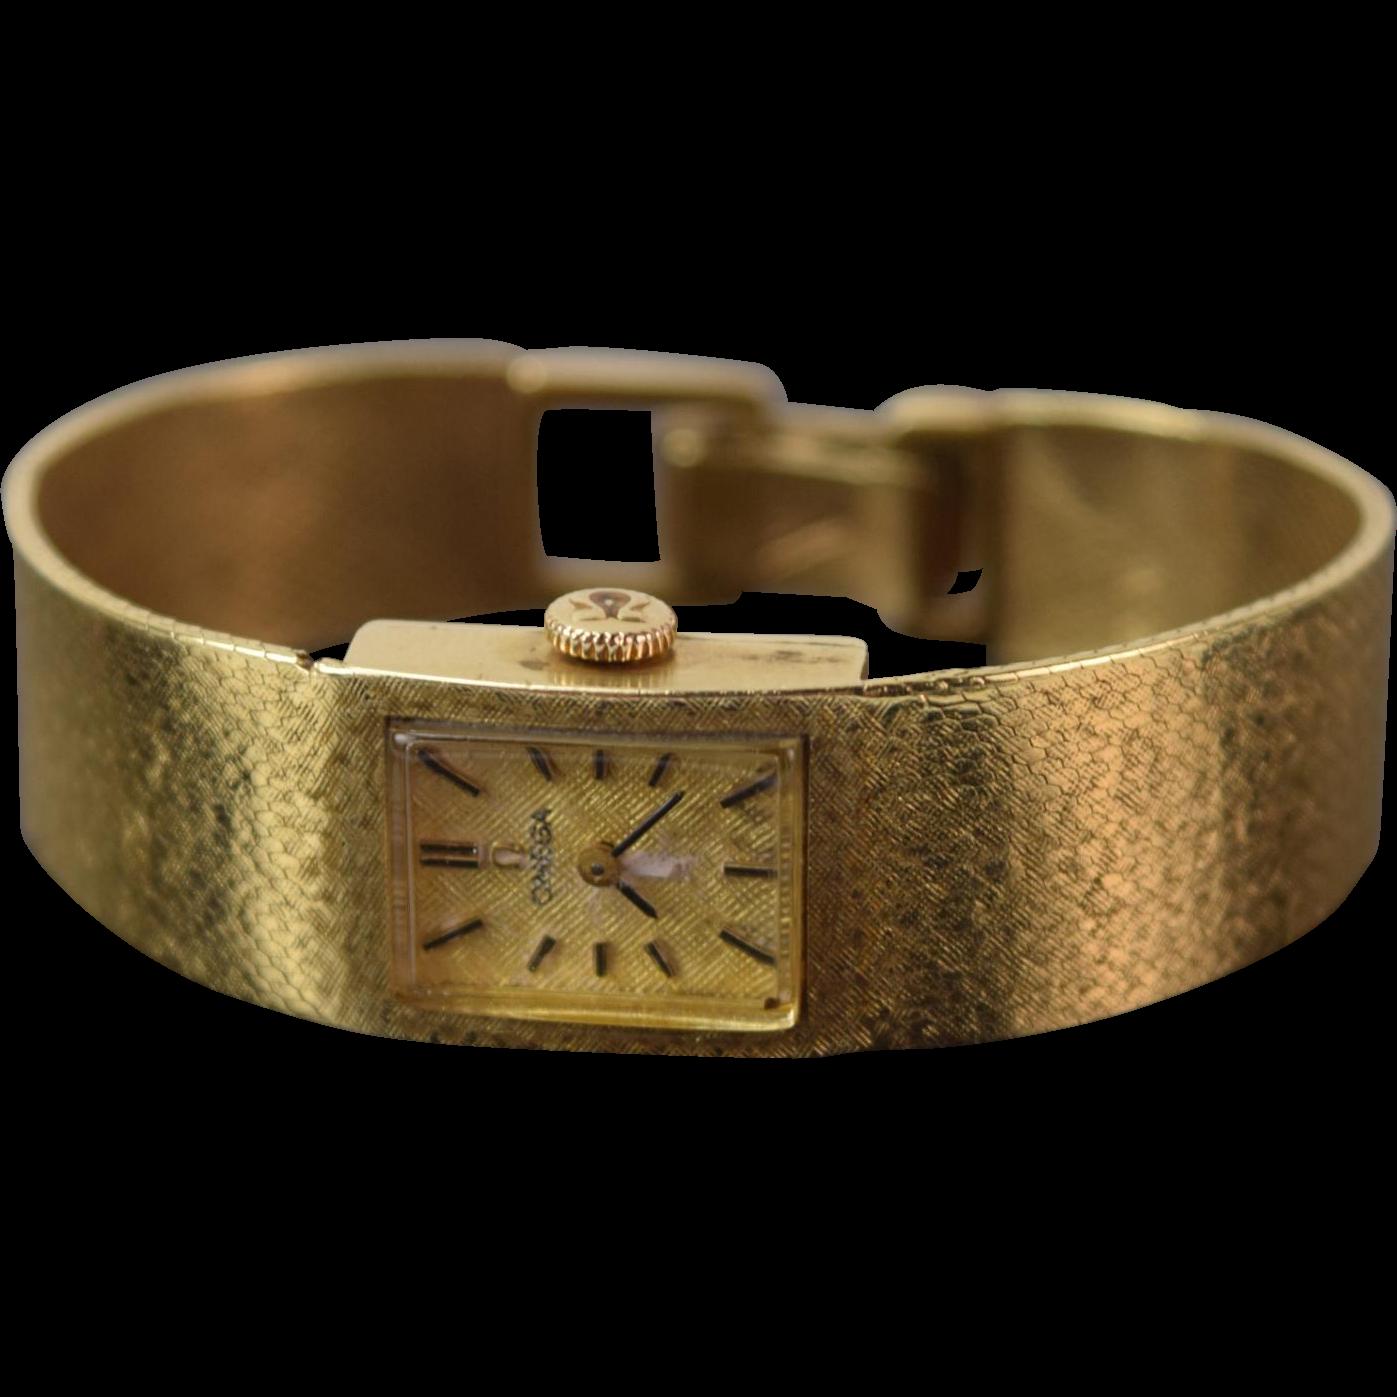 vintage ladies omega watches wristwatches